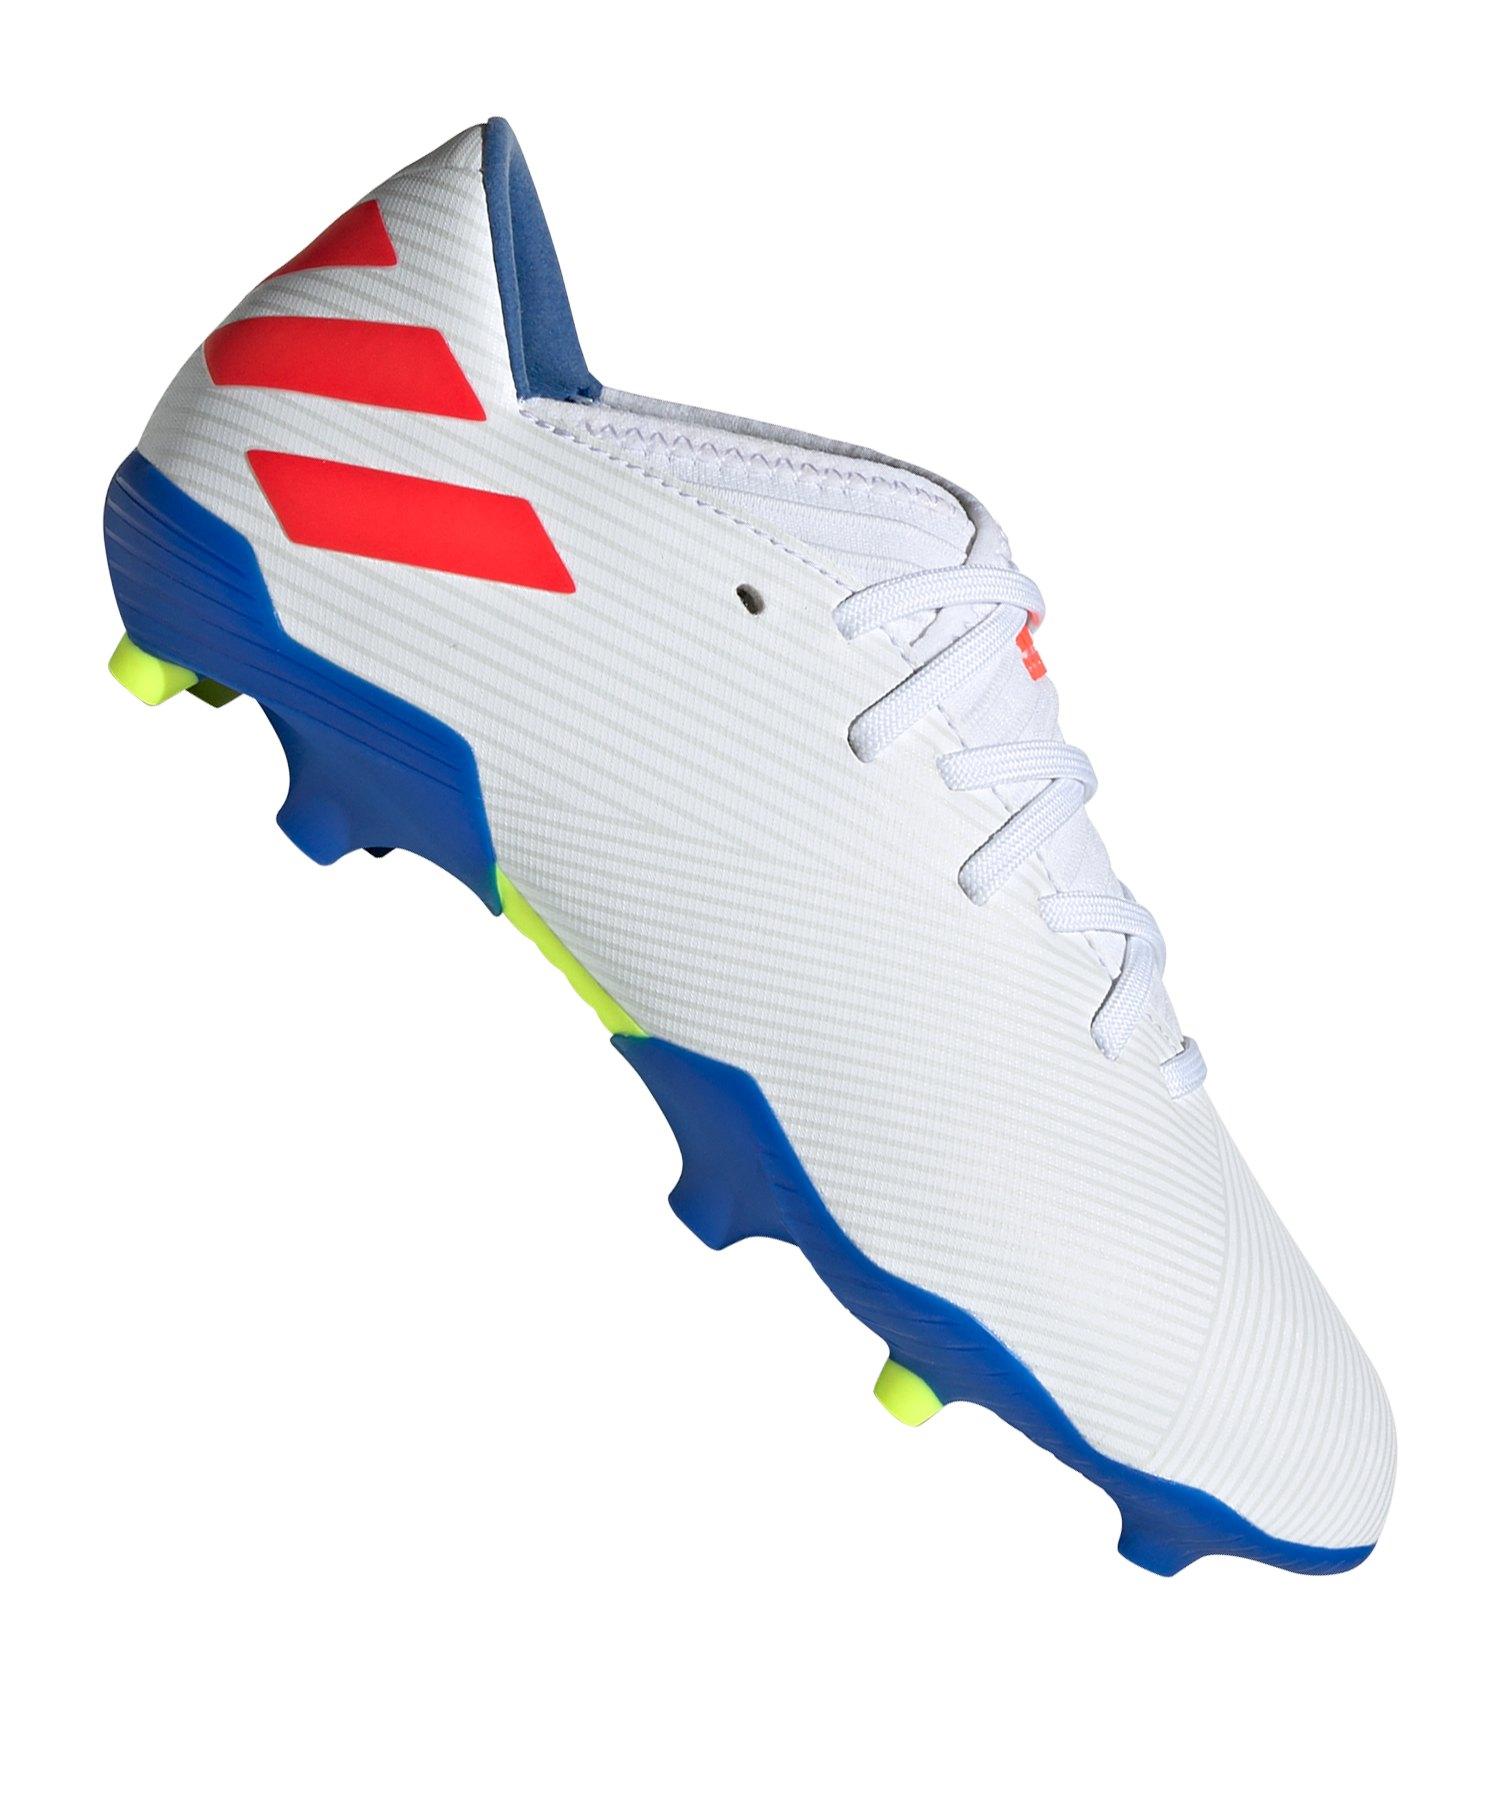 adidas Nemeziz Messi 18.3 FG J Casual Schuhe Kinder Weiß